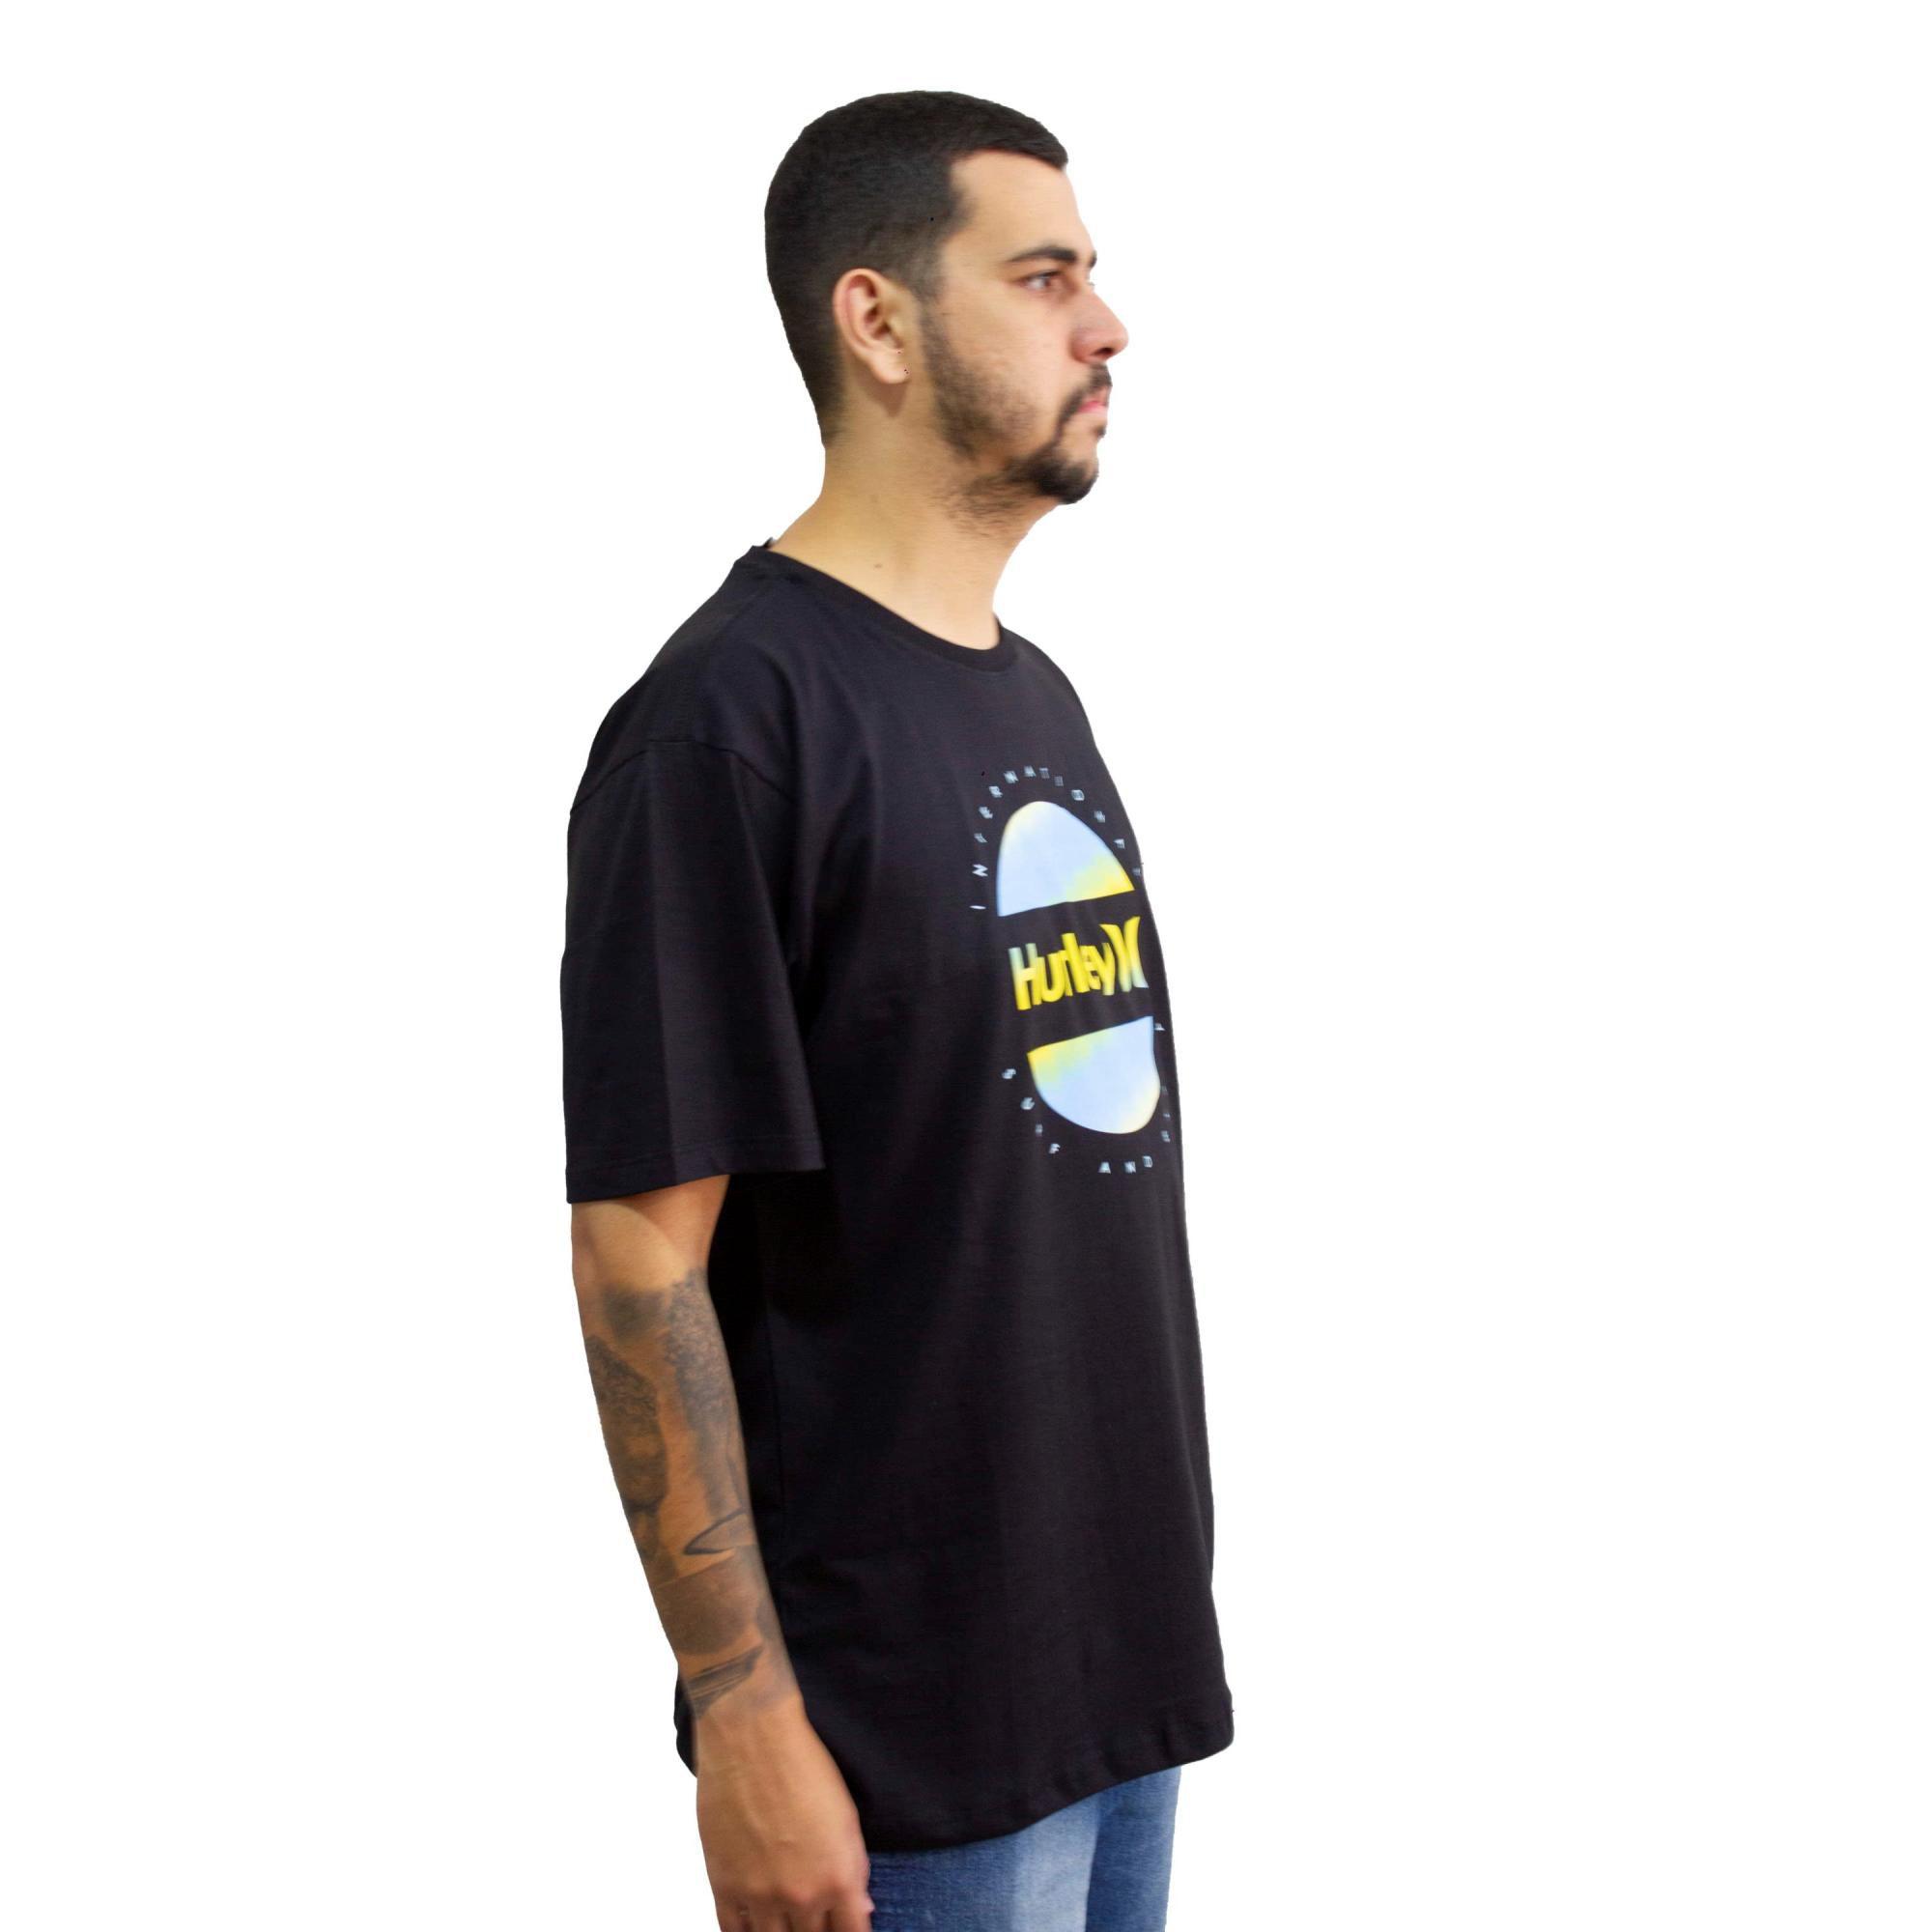 Camiseta Hurley Silk Preta